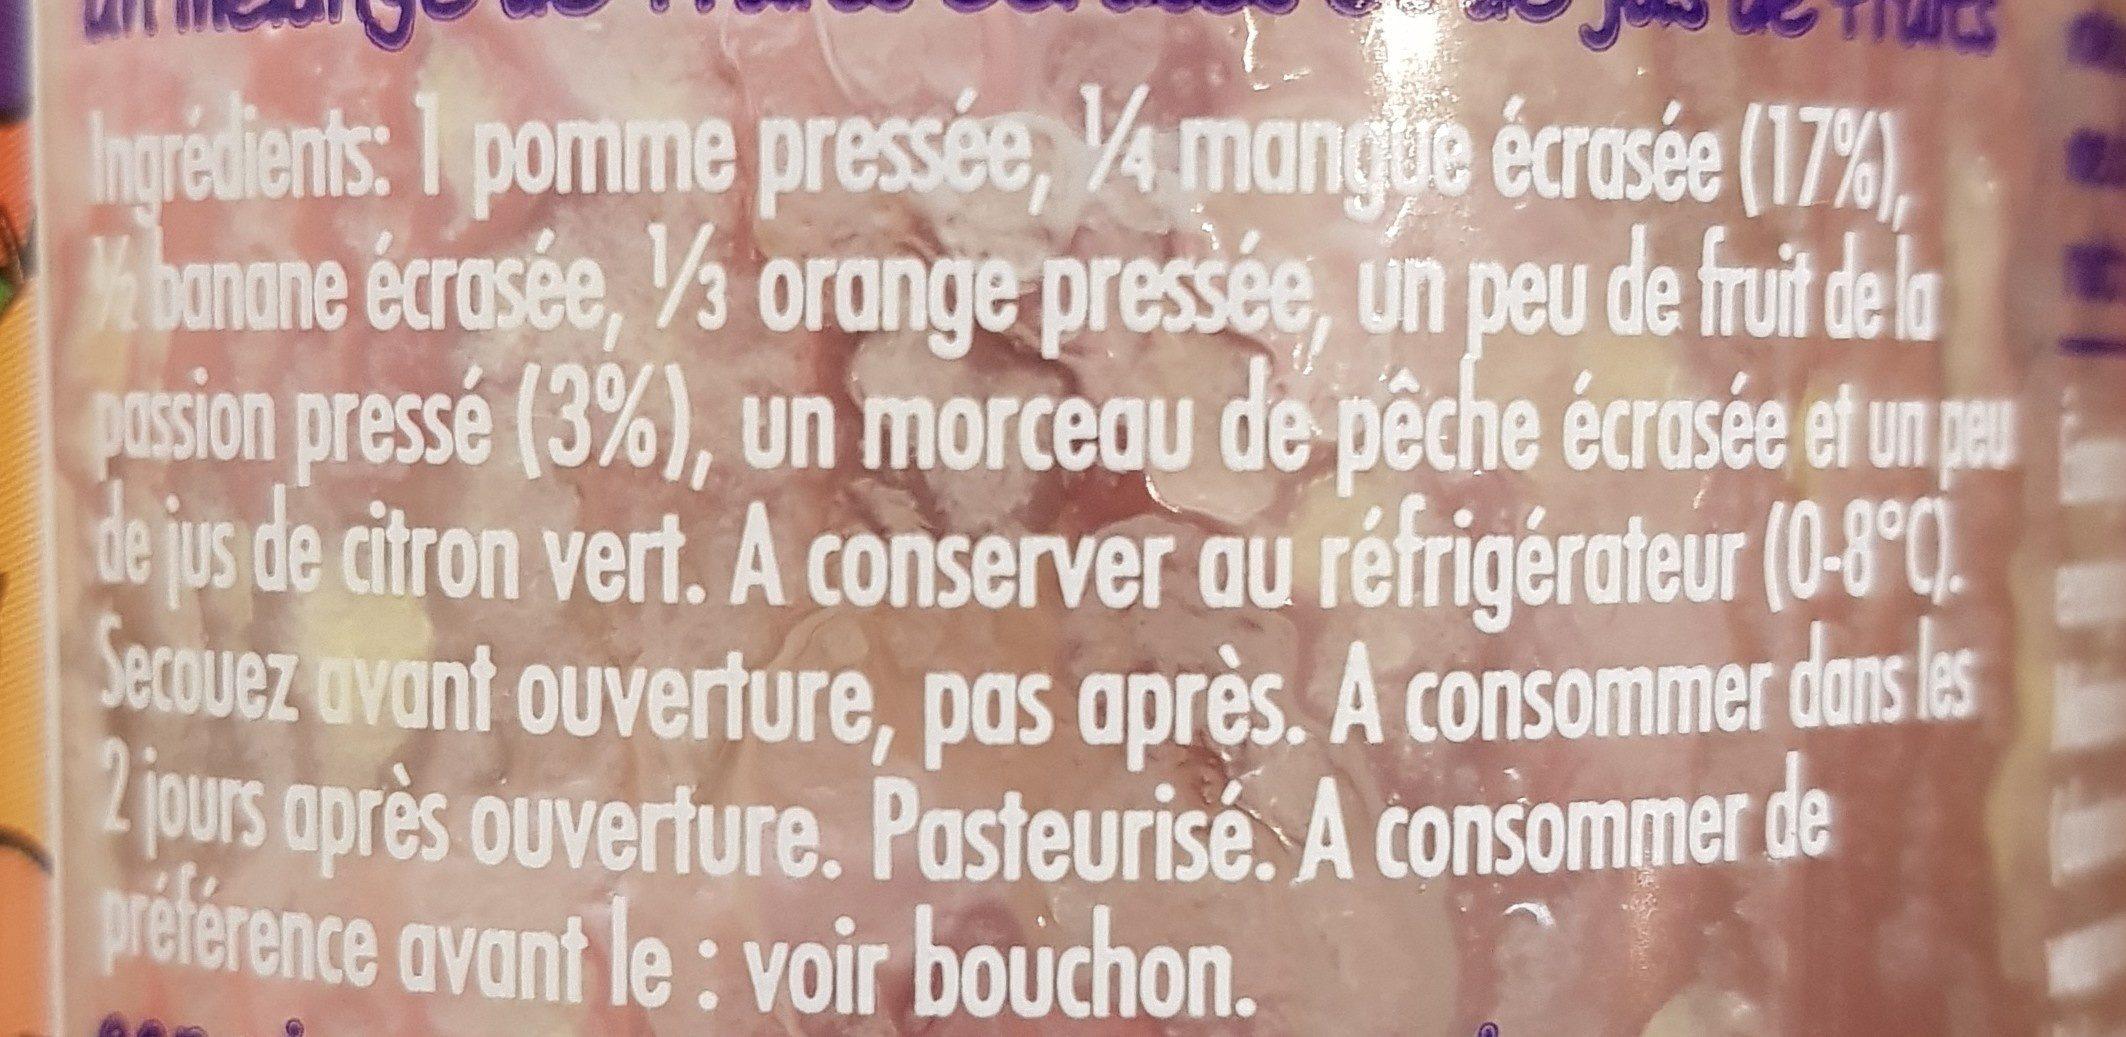 Innocent Sm. mangue Pass. - Ingrediënten